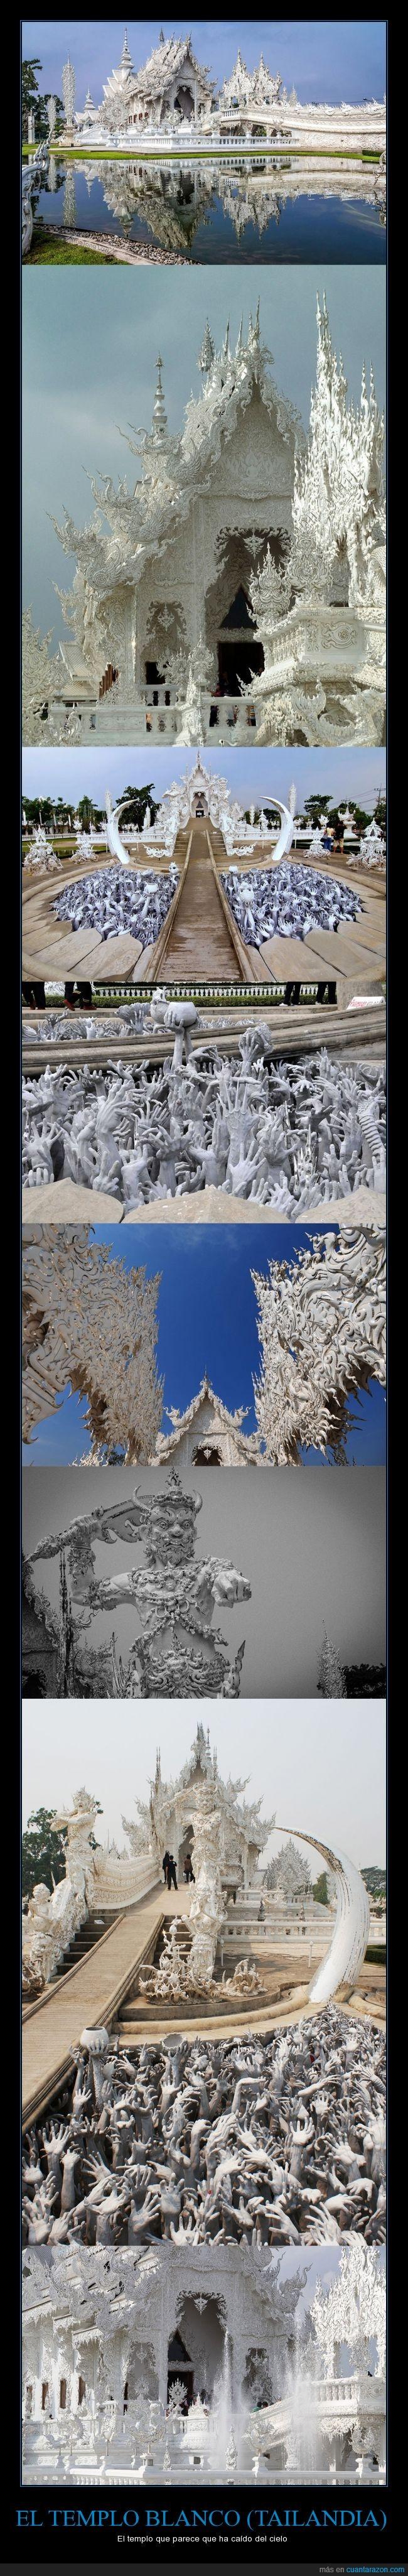 blanco,Chalermchai Kositpipat,tailandia,templo,Wat Rong Khun